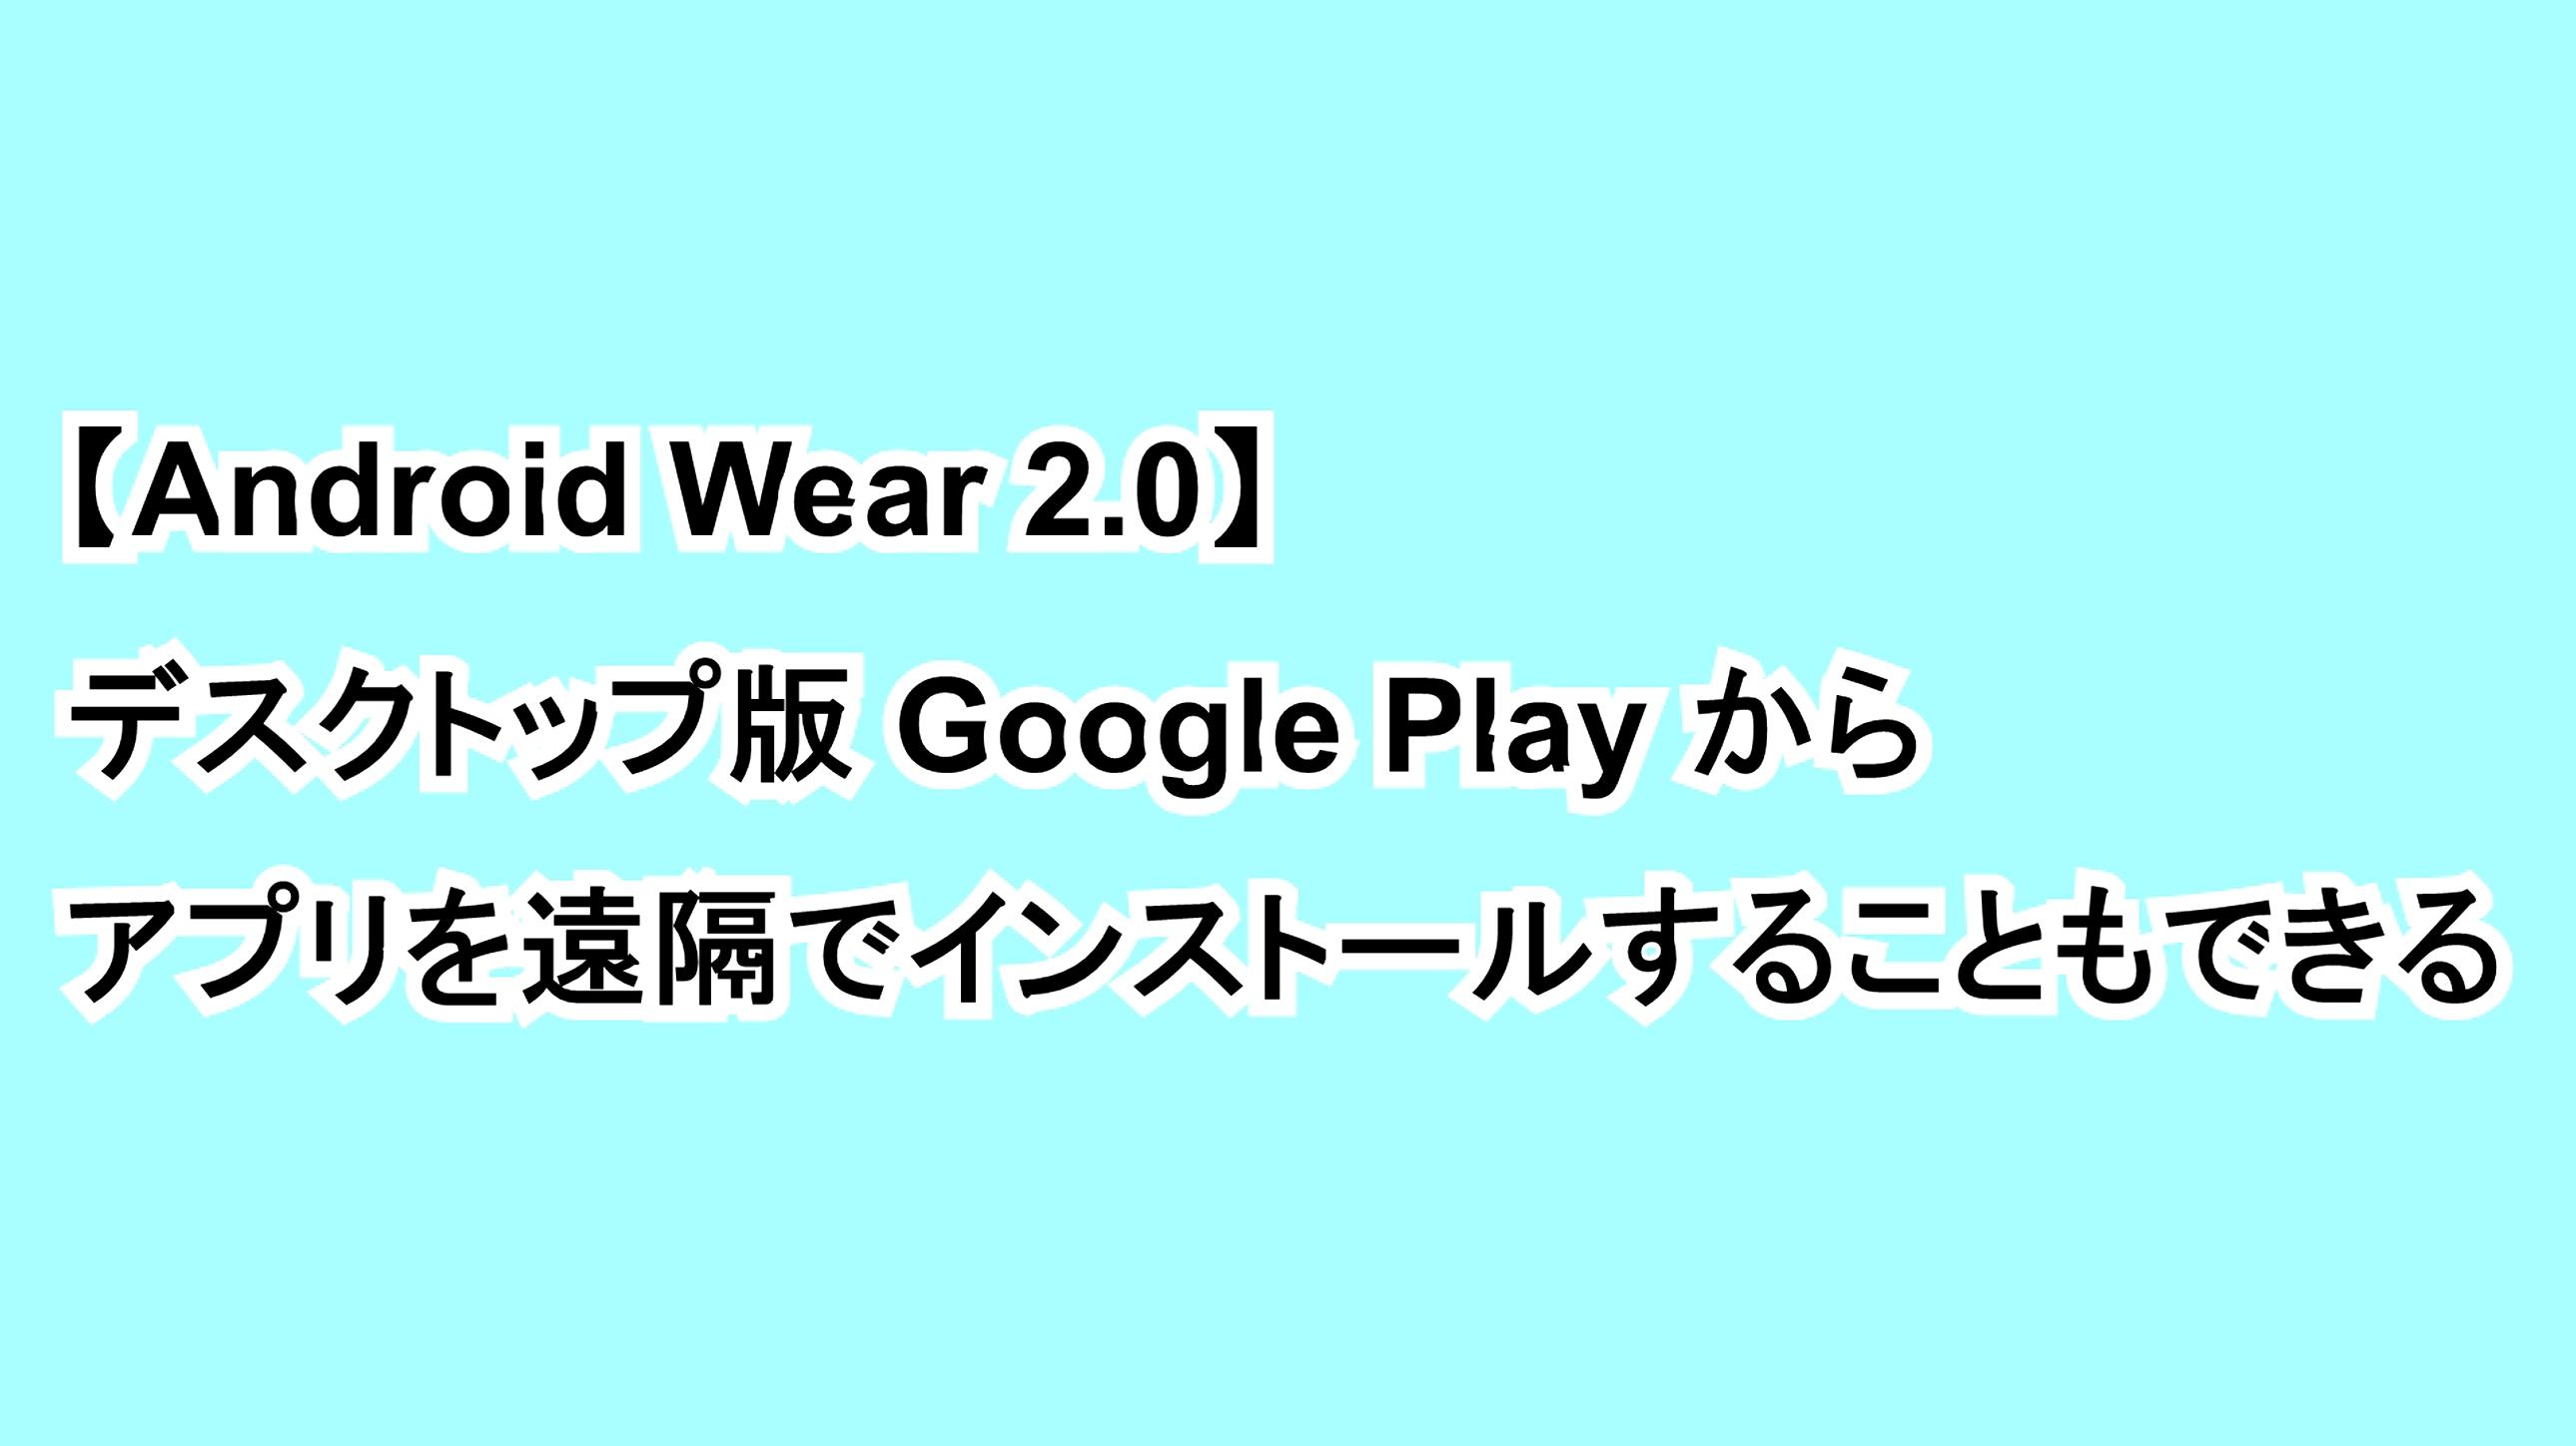 【Android Wear 2.0】デスクトップ版Google Playからアプリを遠隔でインストールすることもできる